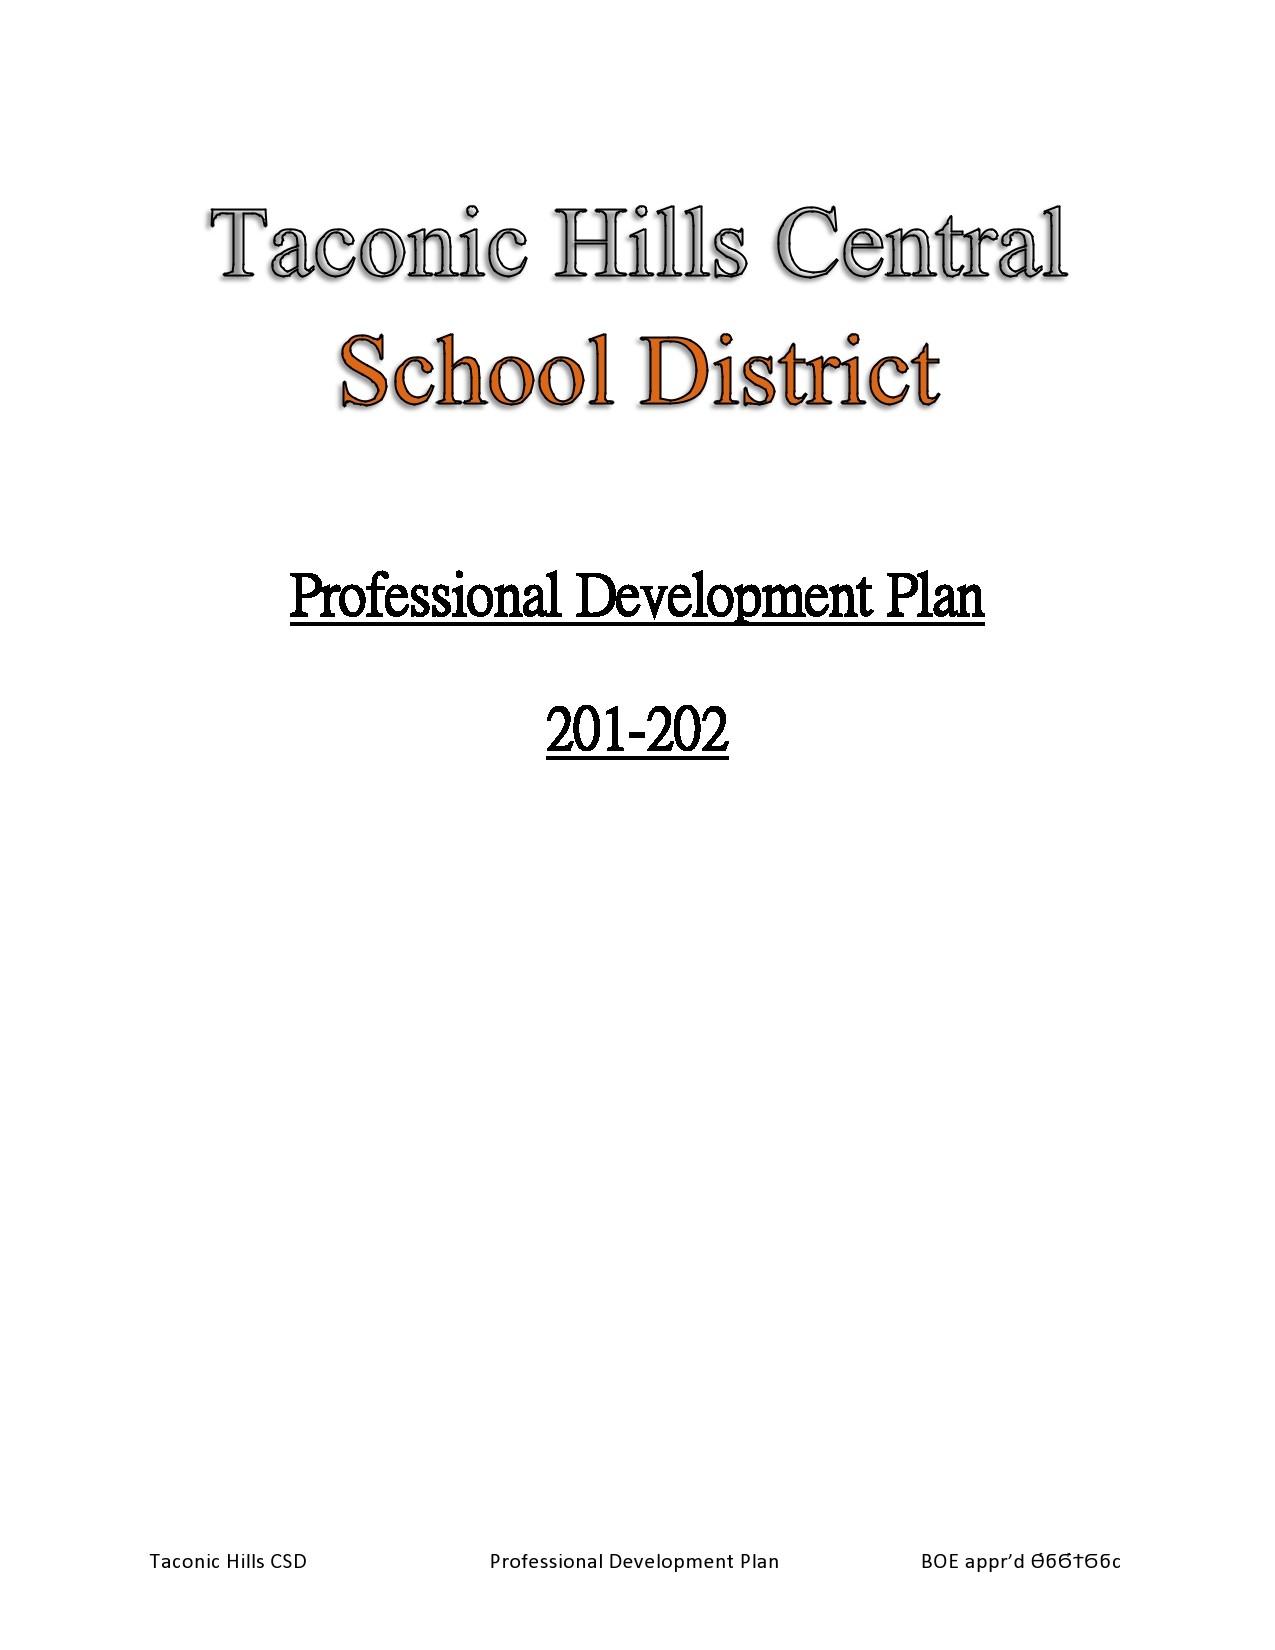 Free professional development plan 48